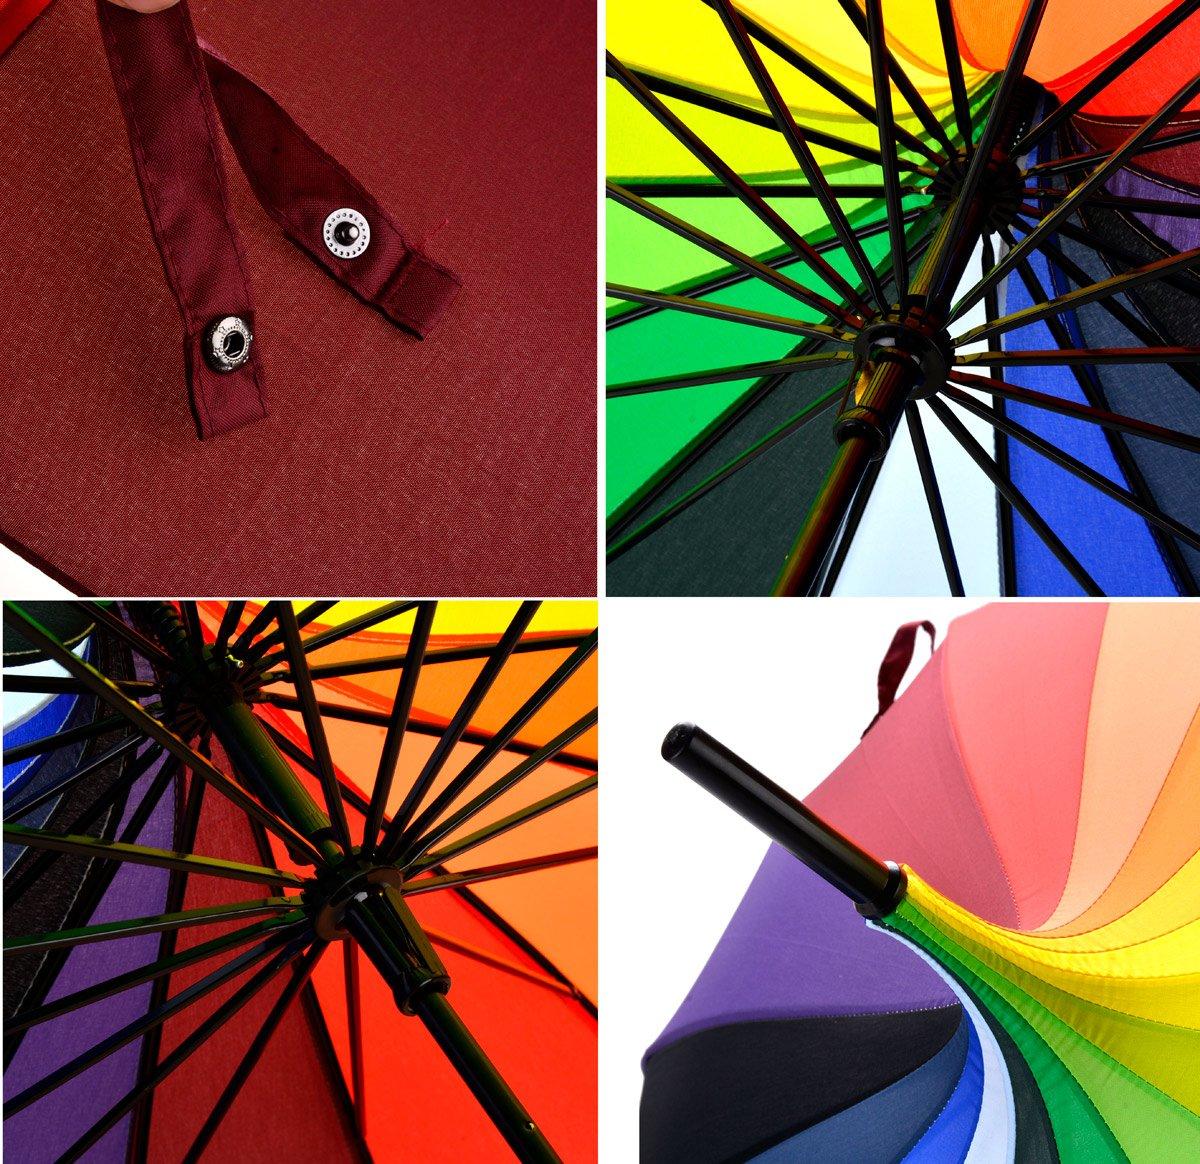 OUTGEEK Rainbow Umbrella Pagoda Long Handle Vintage Windproof Umbrella Parasol 6